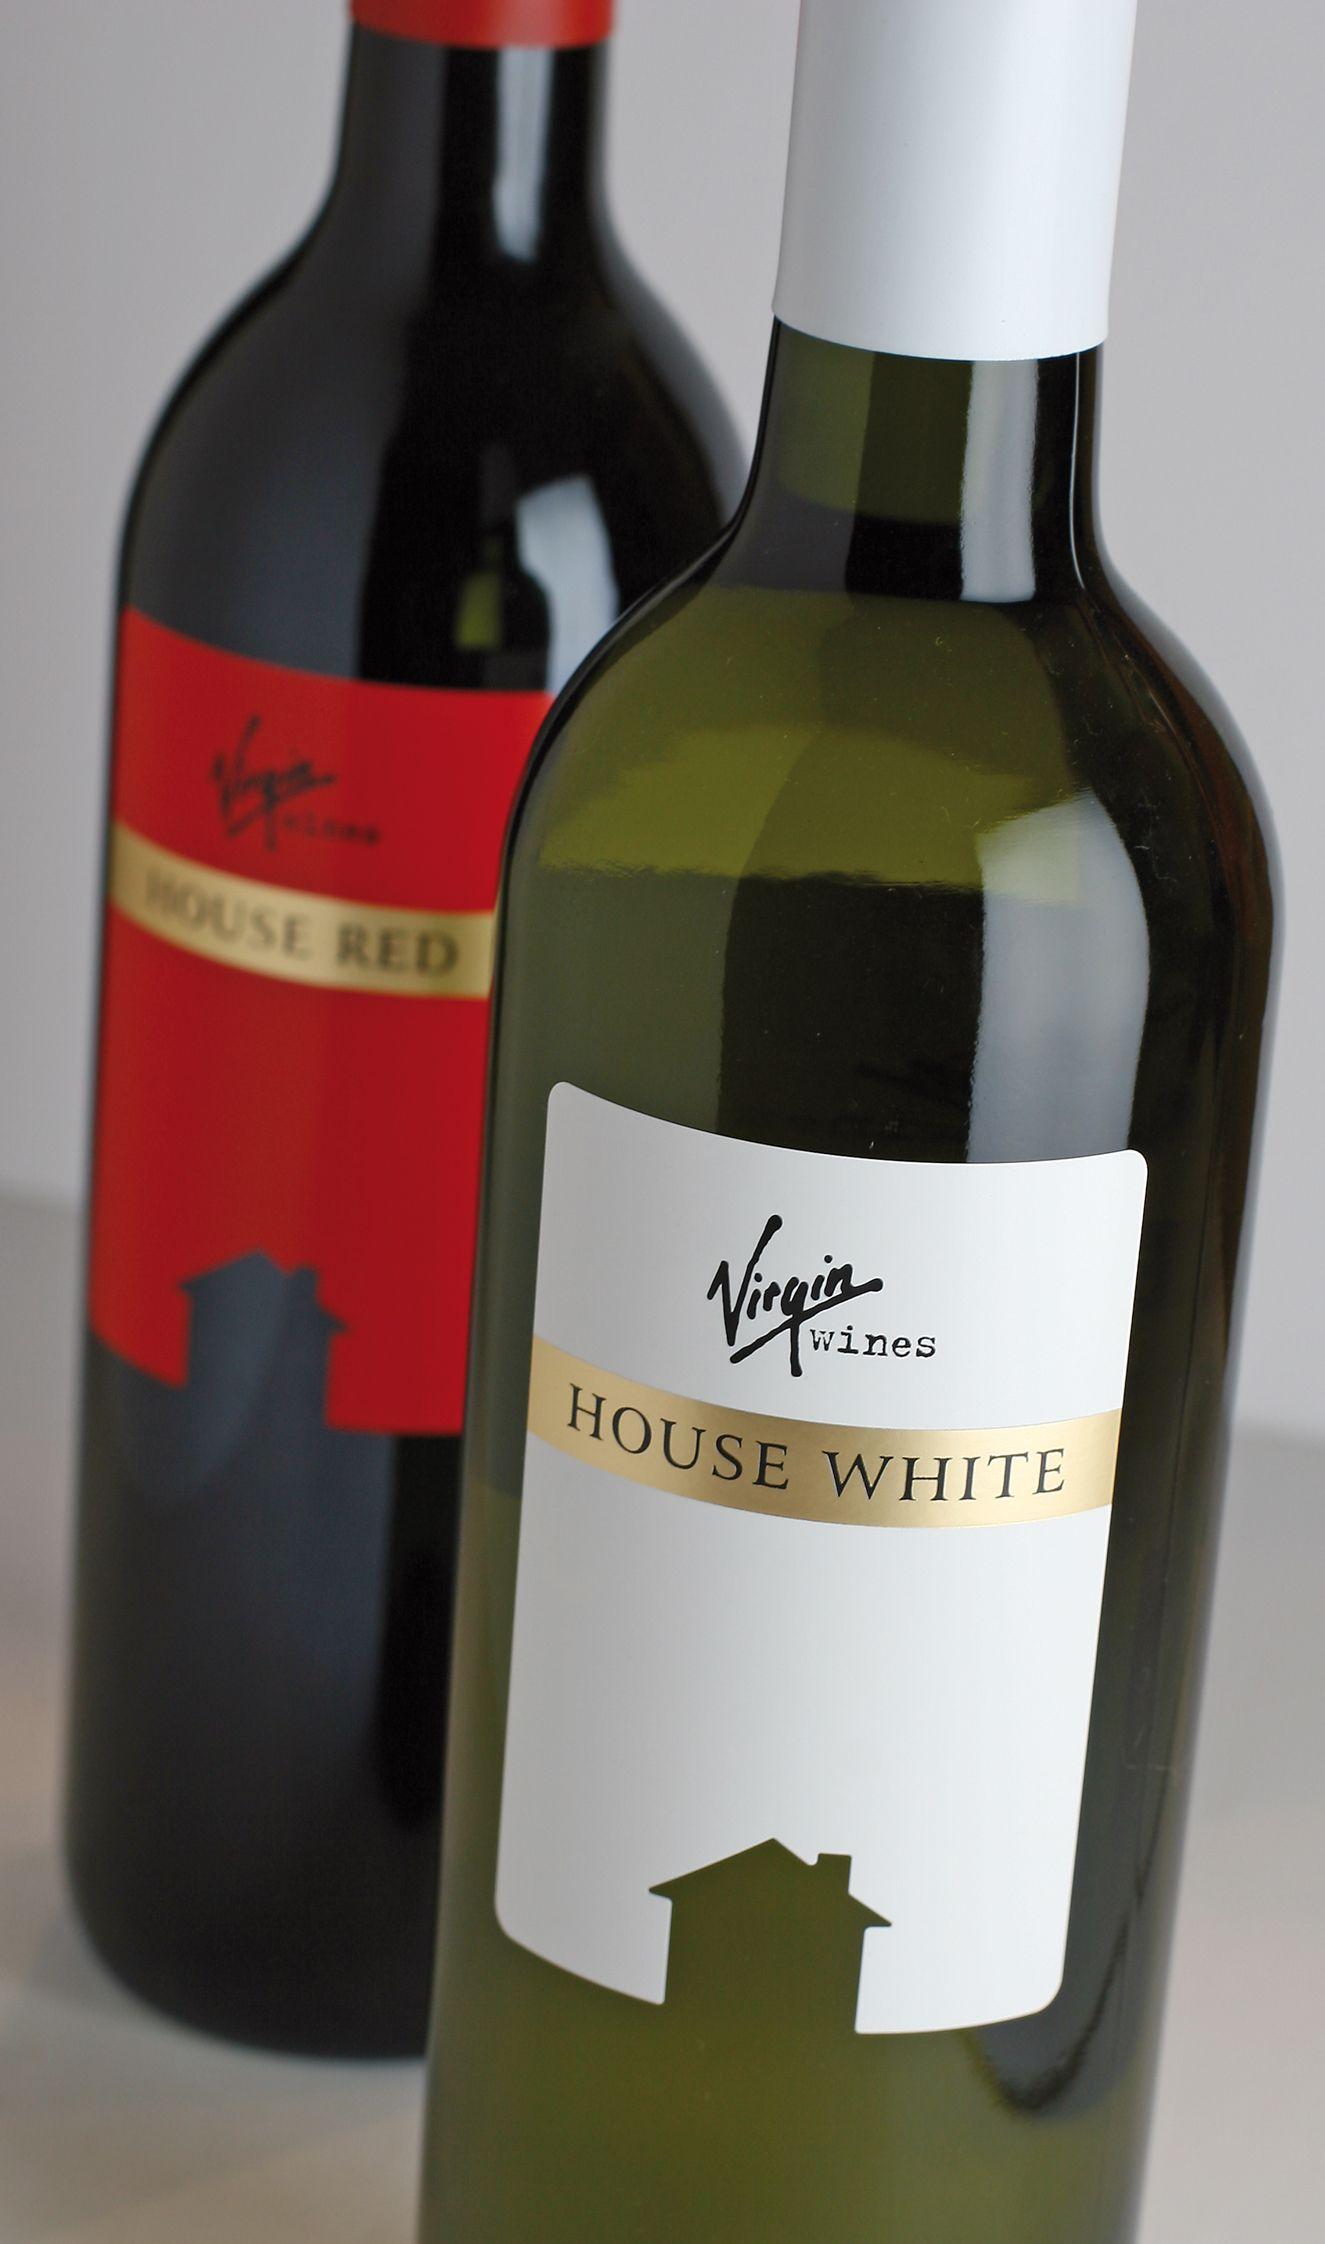 Virgin House Wines Exactly What It Says Wine Spirit Design Awards 2008 Wine Range Design Of The Year Trophy New York Butylochnye Etiketki Alkogol Papka